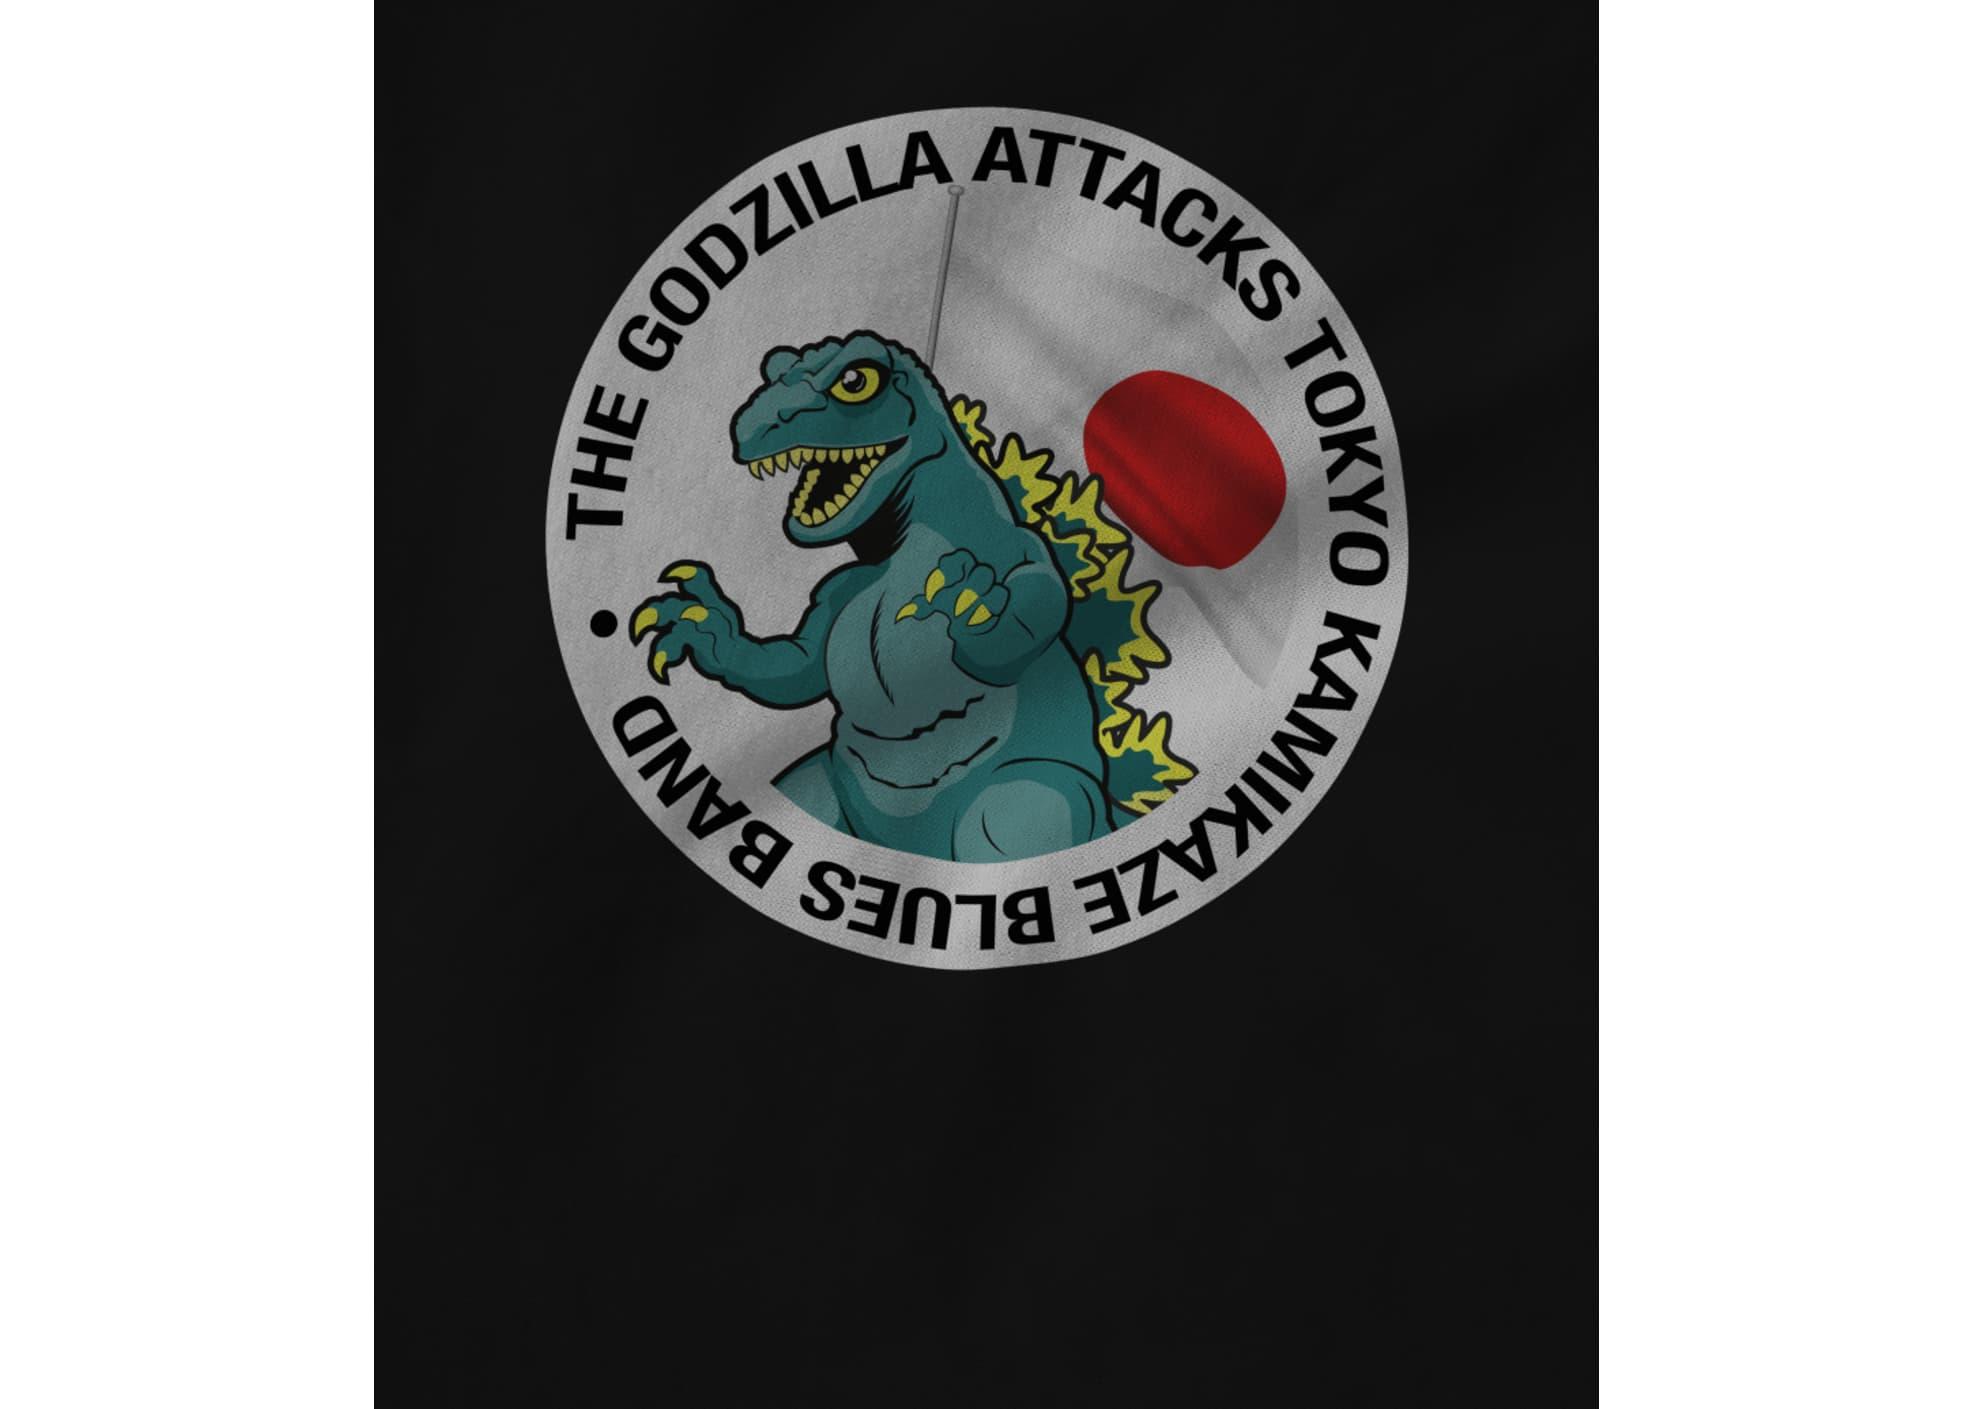 The godzilla attacks tokyo kamikaze blues band  godzilla logo shirt 1601408803